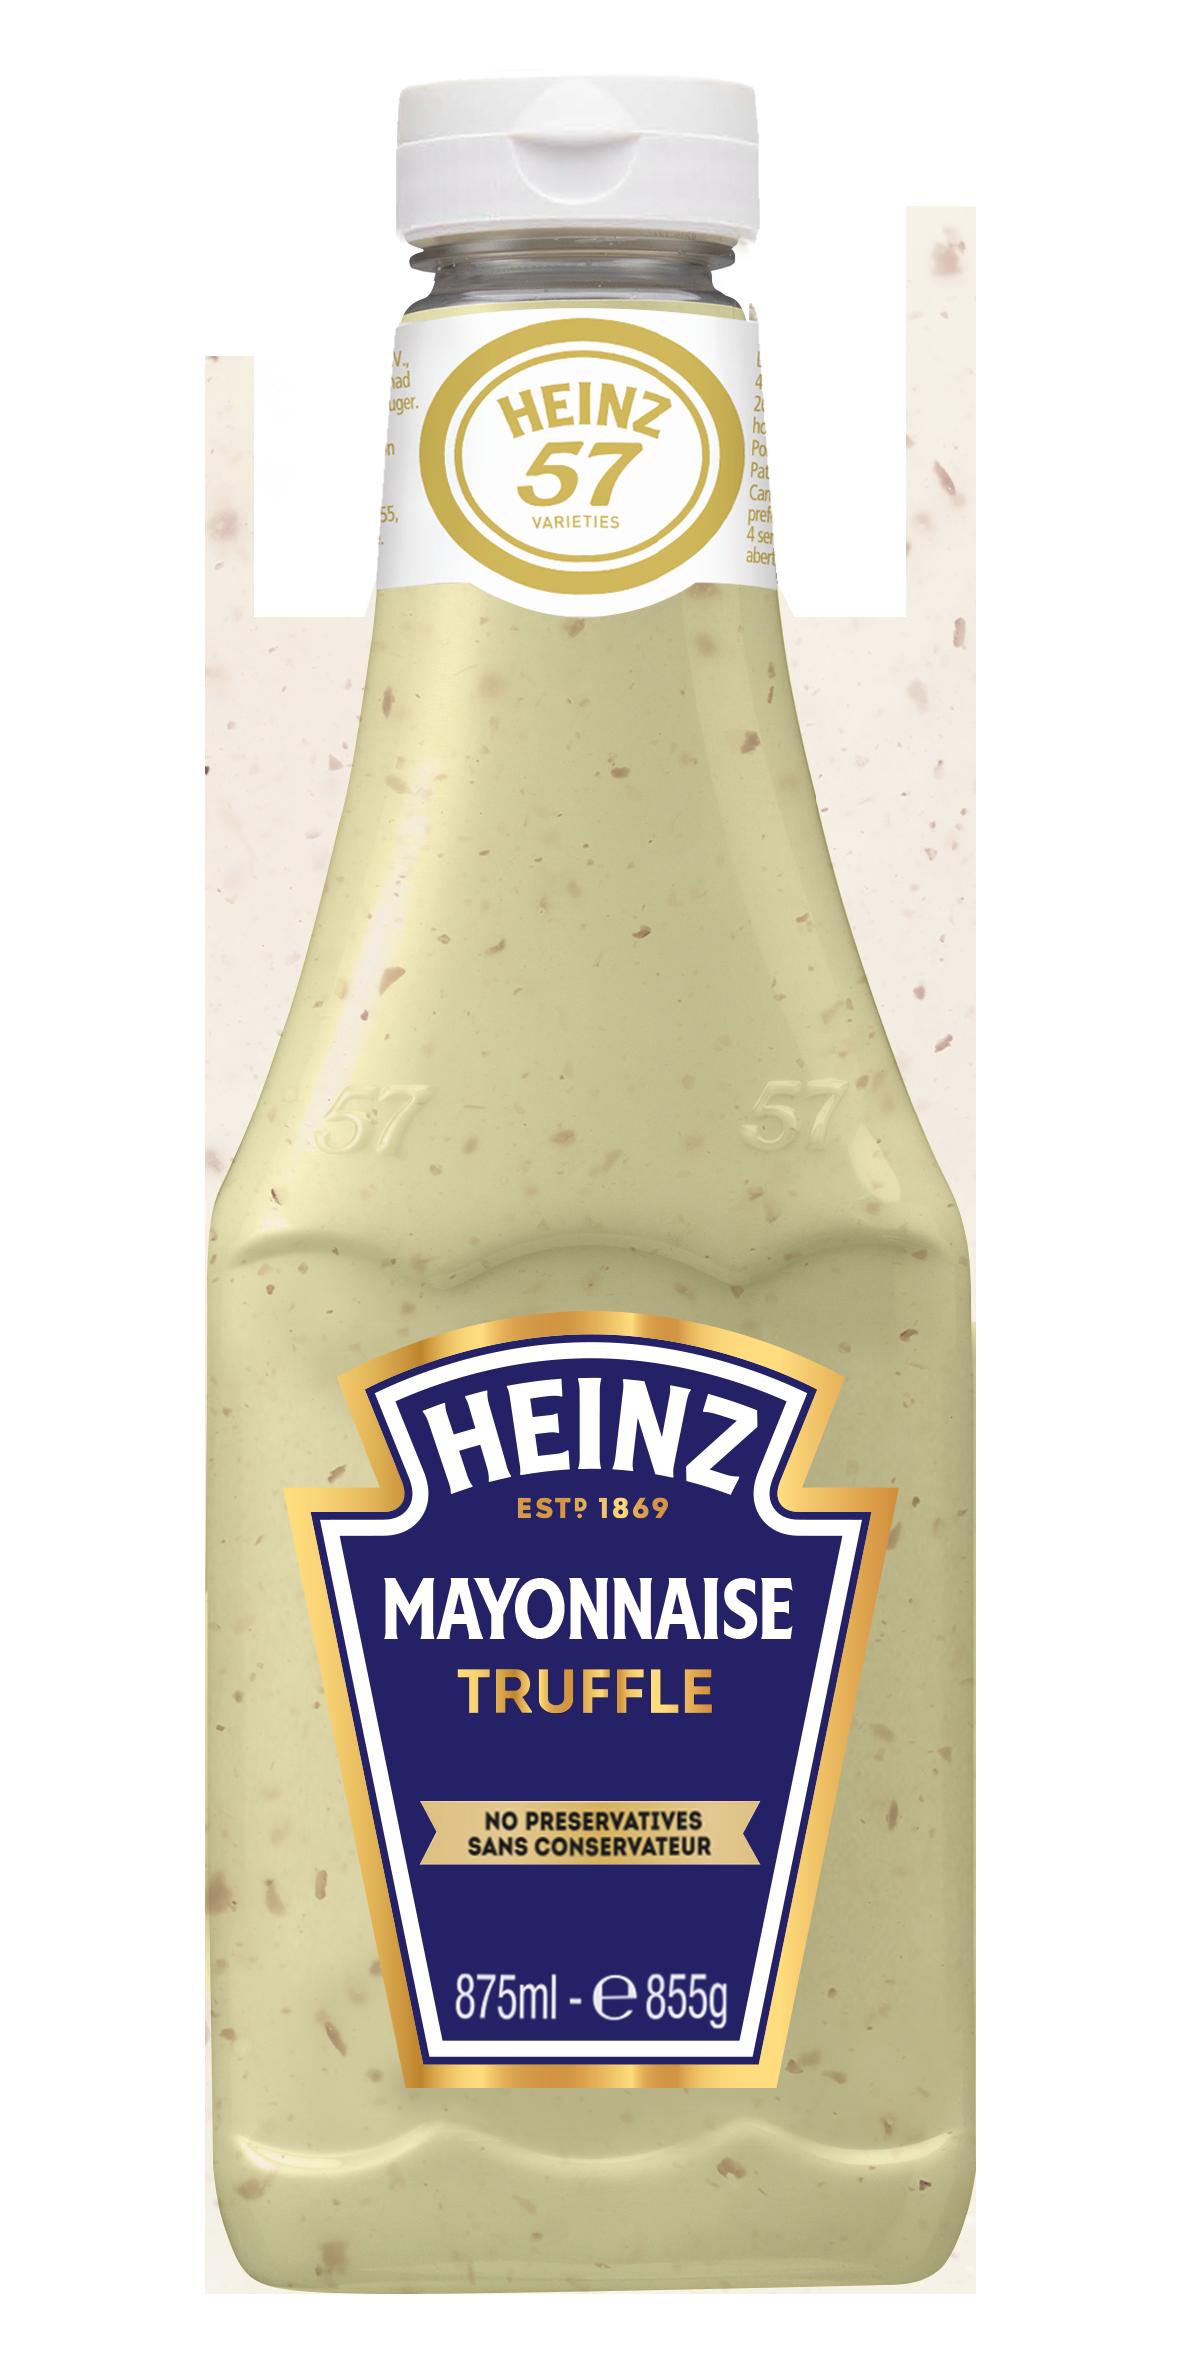 Heinz Truffle Mayonnaise 875ml image